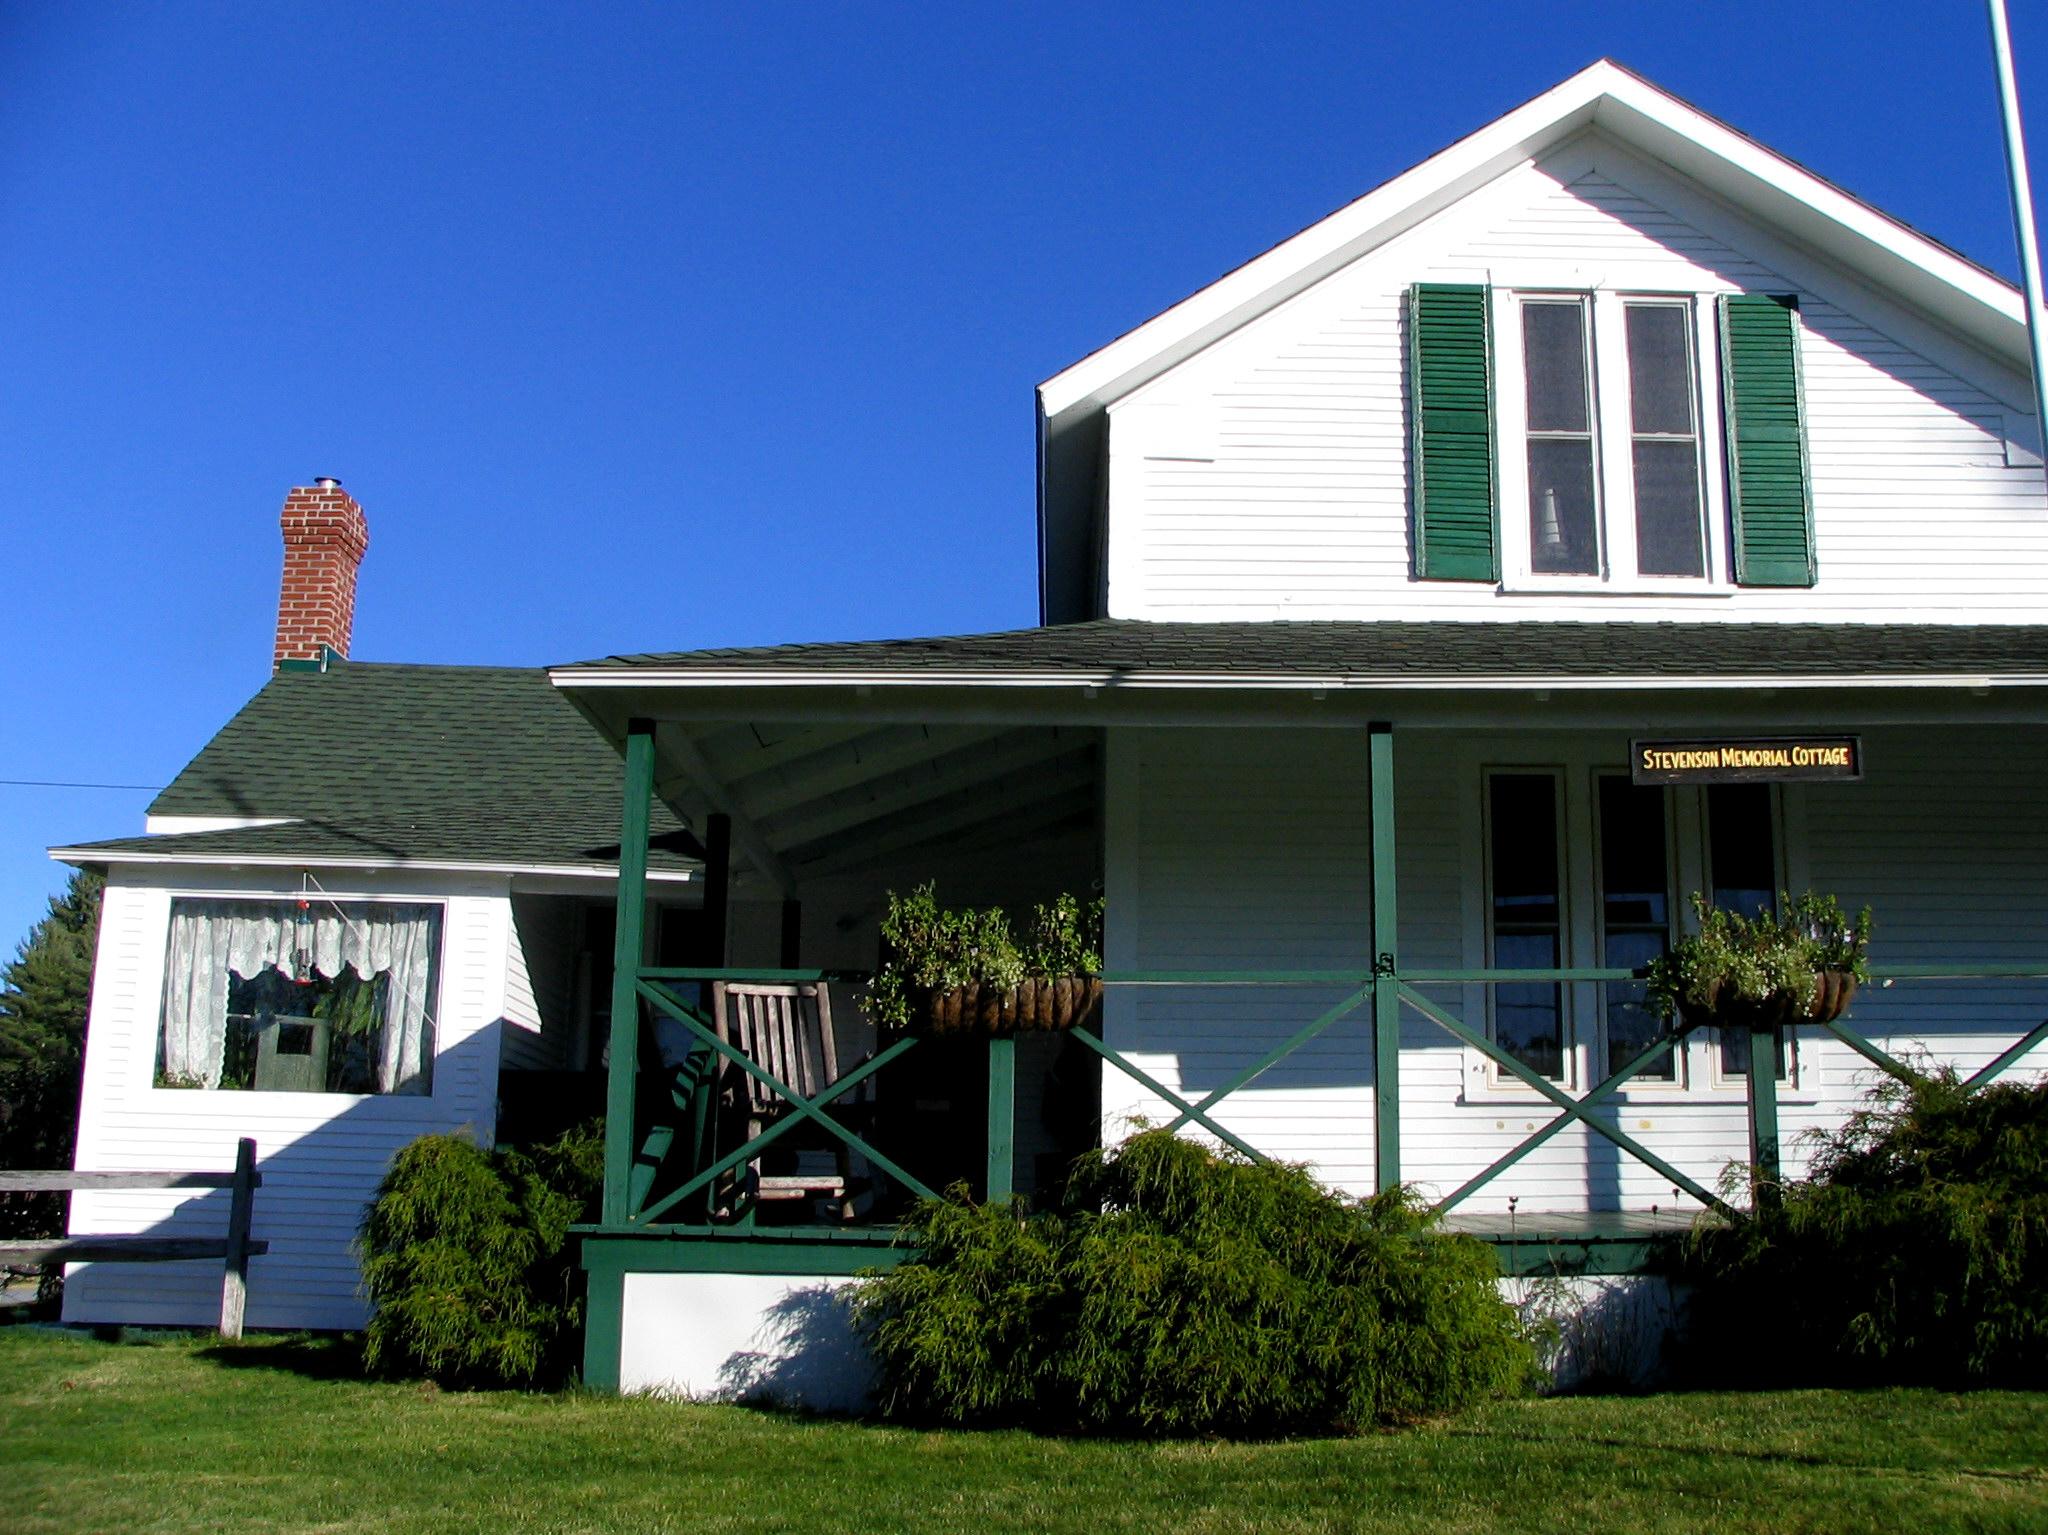 https://upload.wikimedia.org/wikipedia/commons/d/d0/Saranac_Lake_-_Stevenson_Cottage.jpg